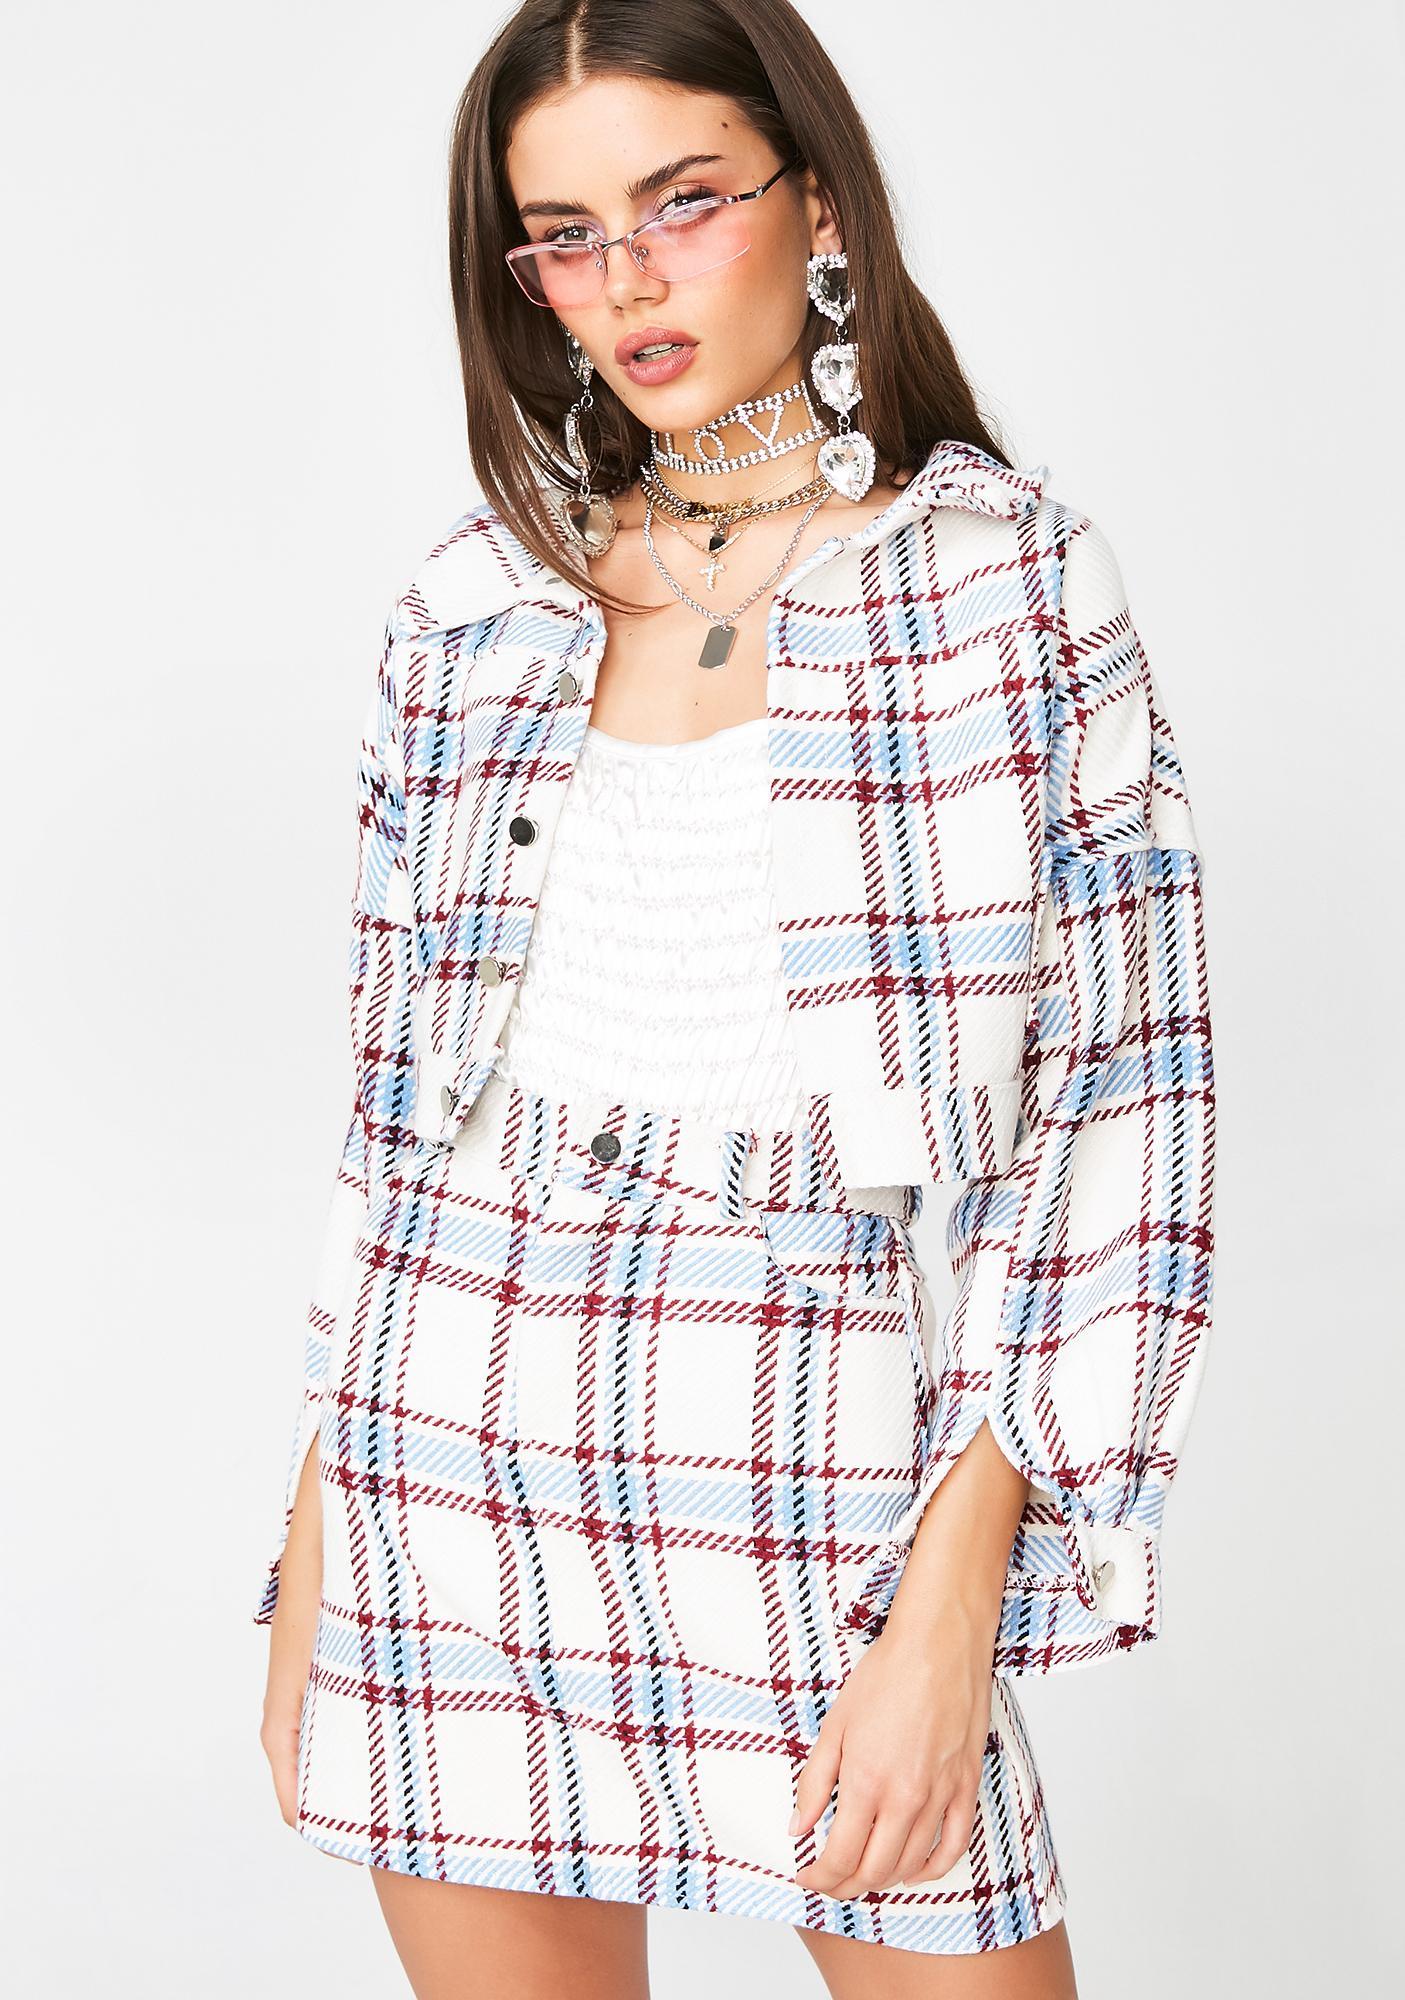 My Mum Made It Plaid Jacket N' Skirt Matching Set